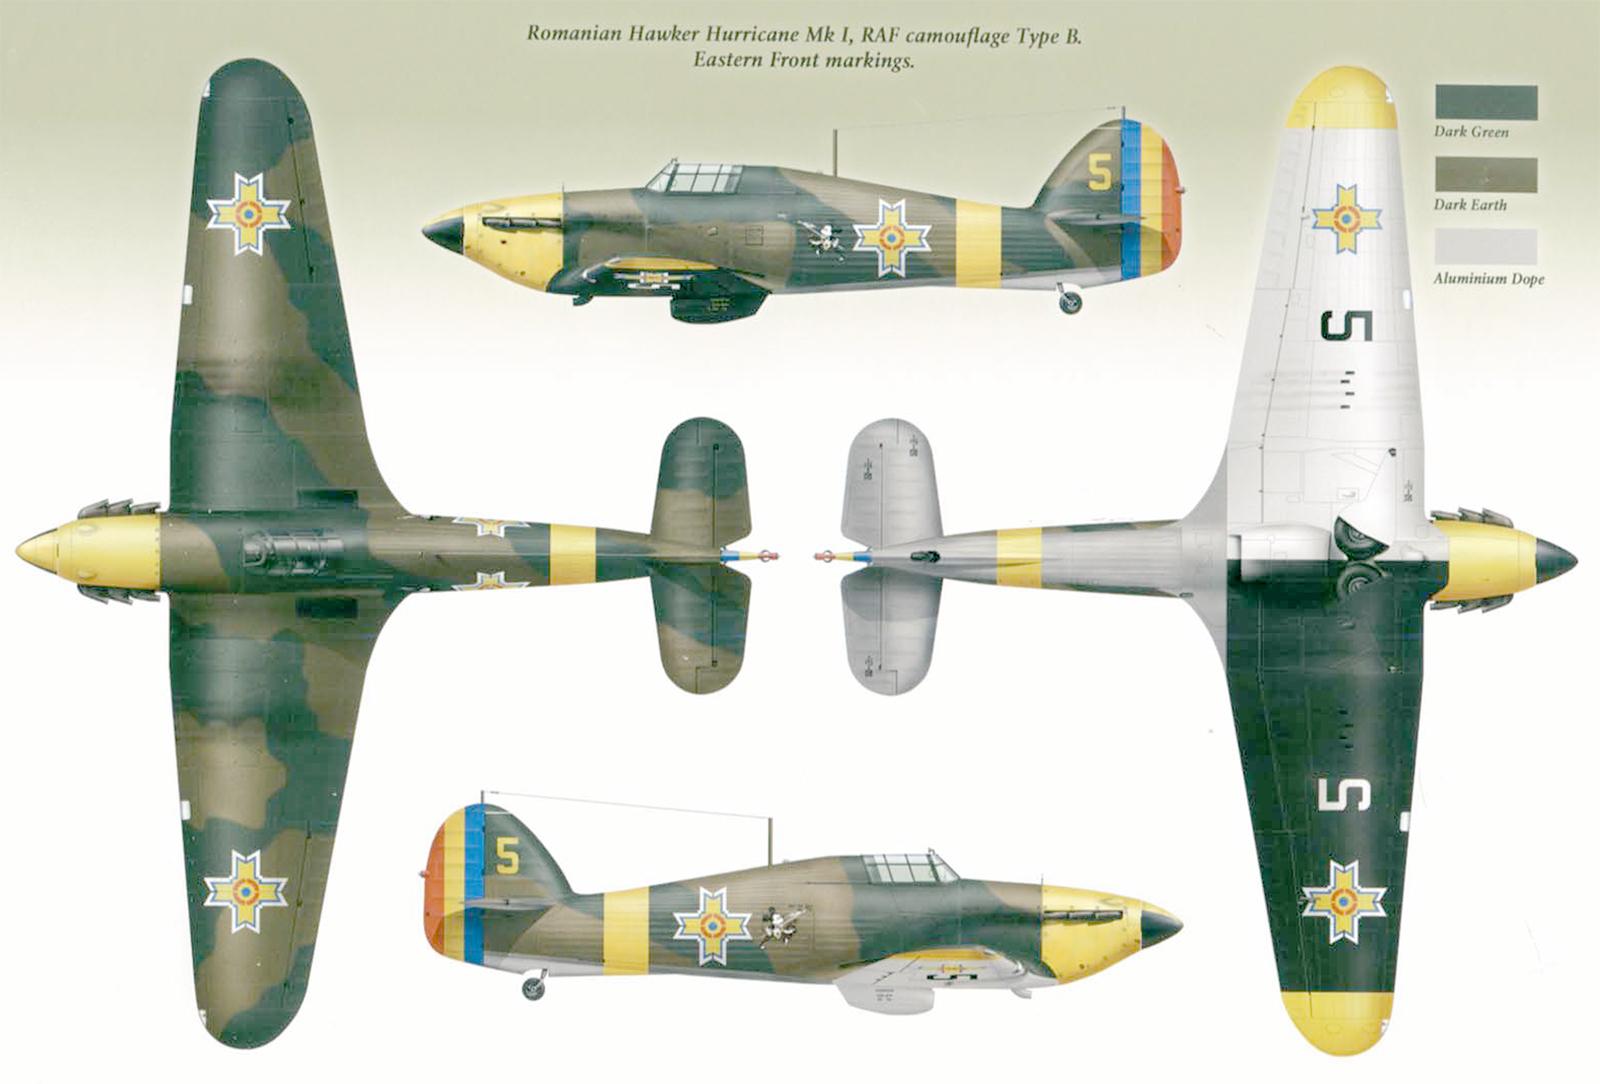 Hawker Hurricane Rumanian AF Esc 53 Yellow 5 Horia Agarici Rumania 1941 Mushroom 9111 0A